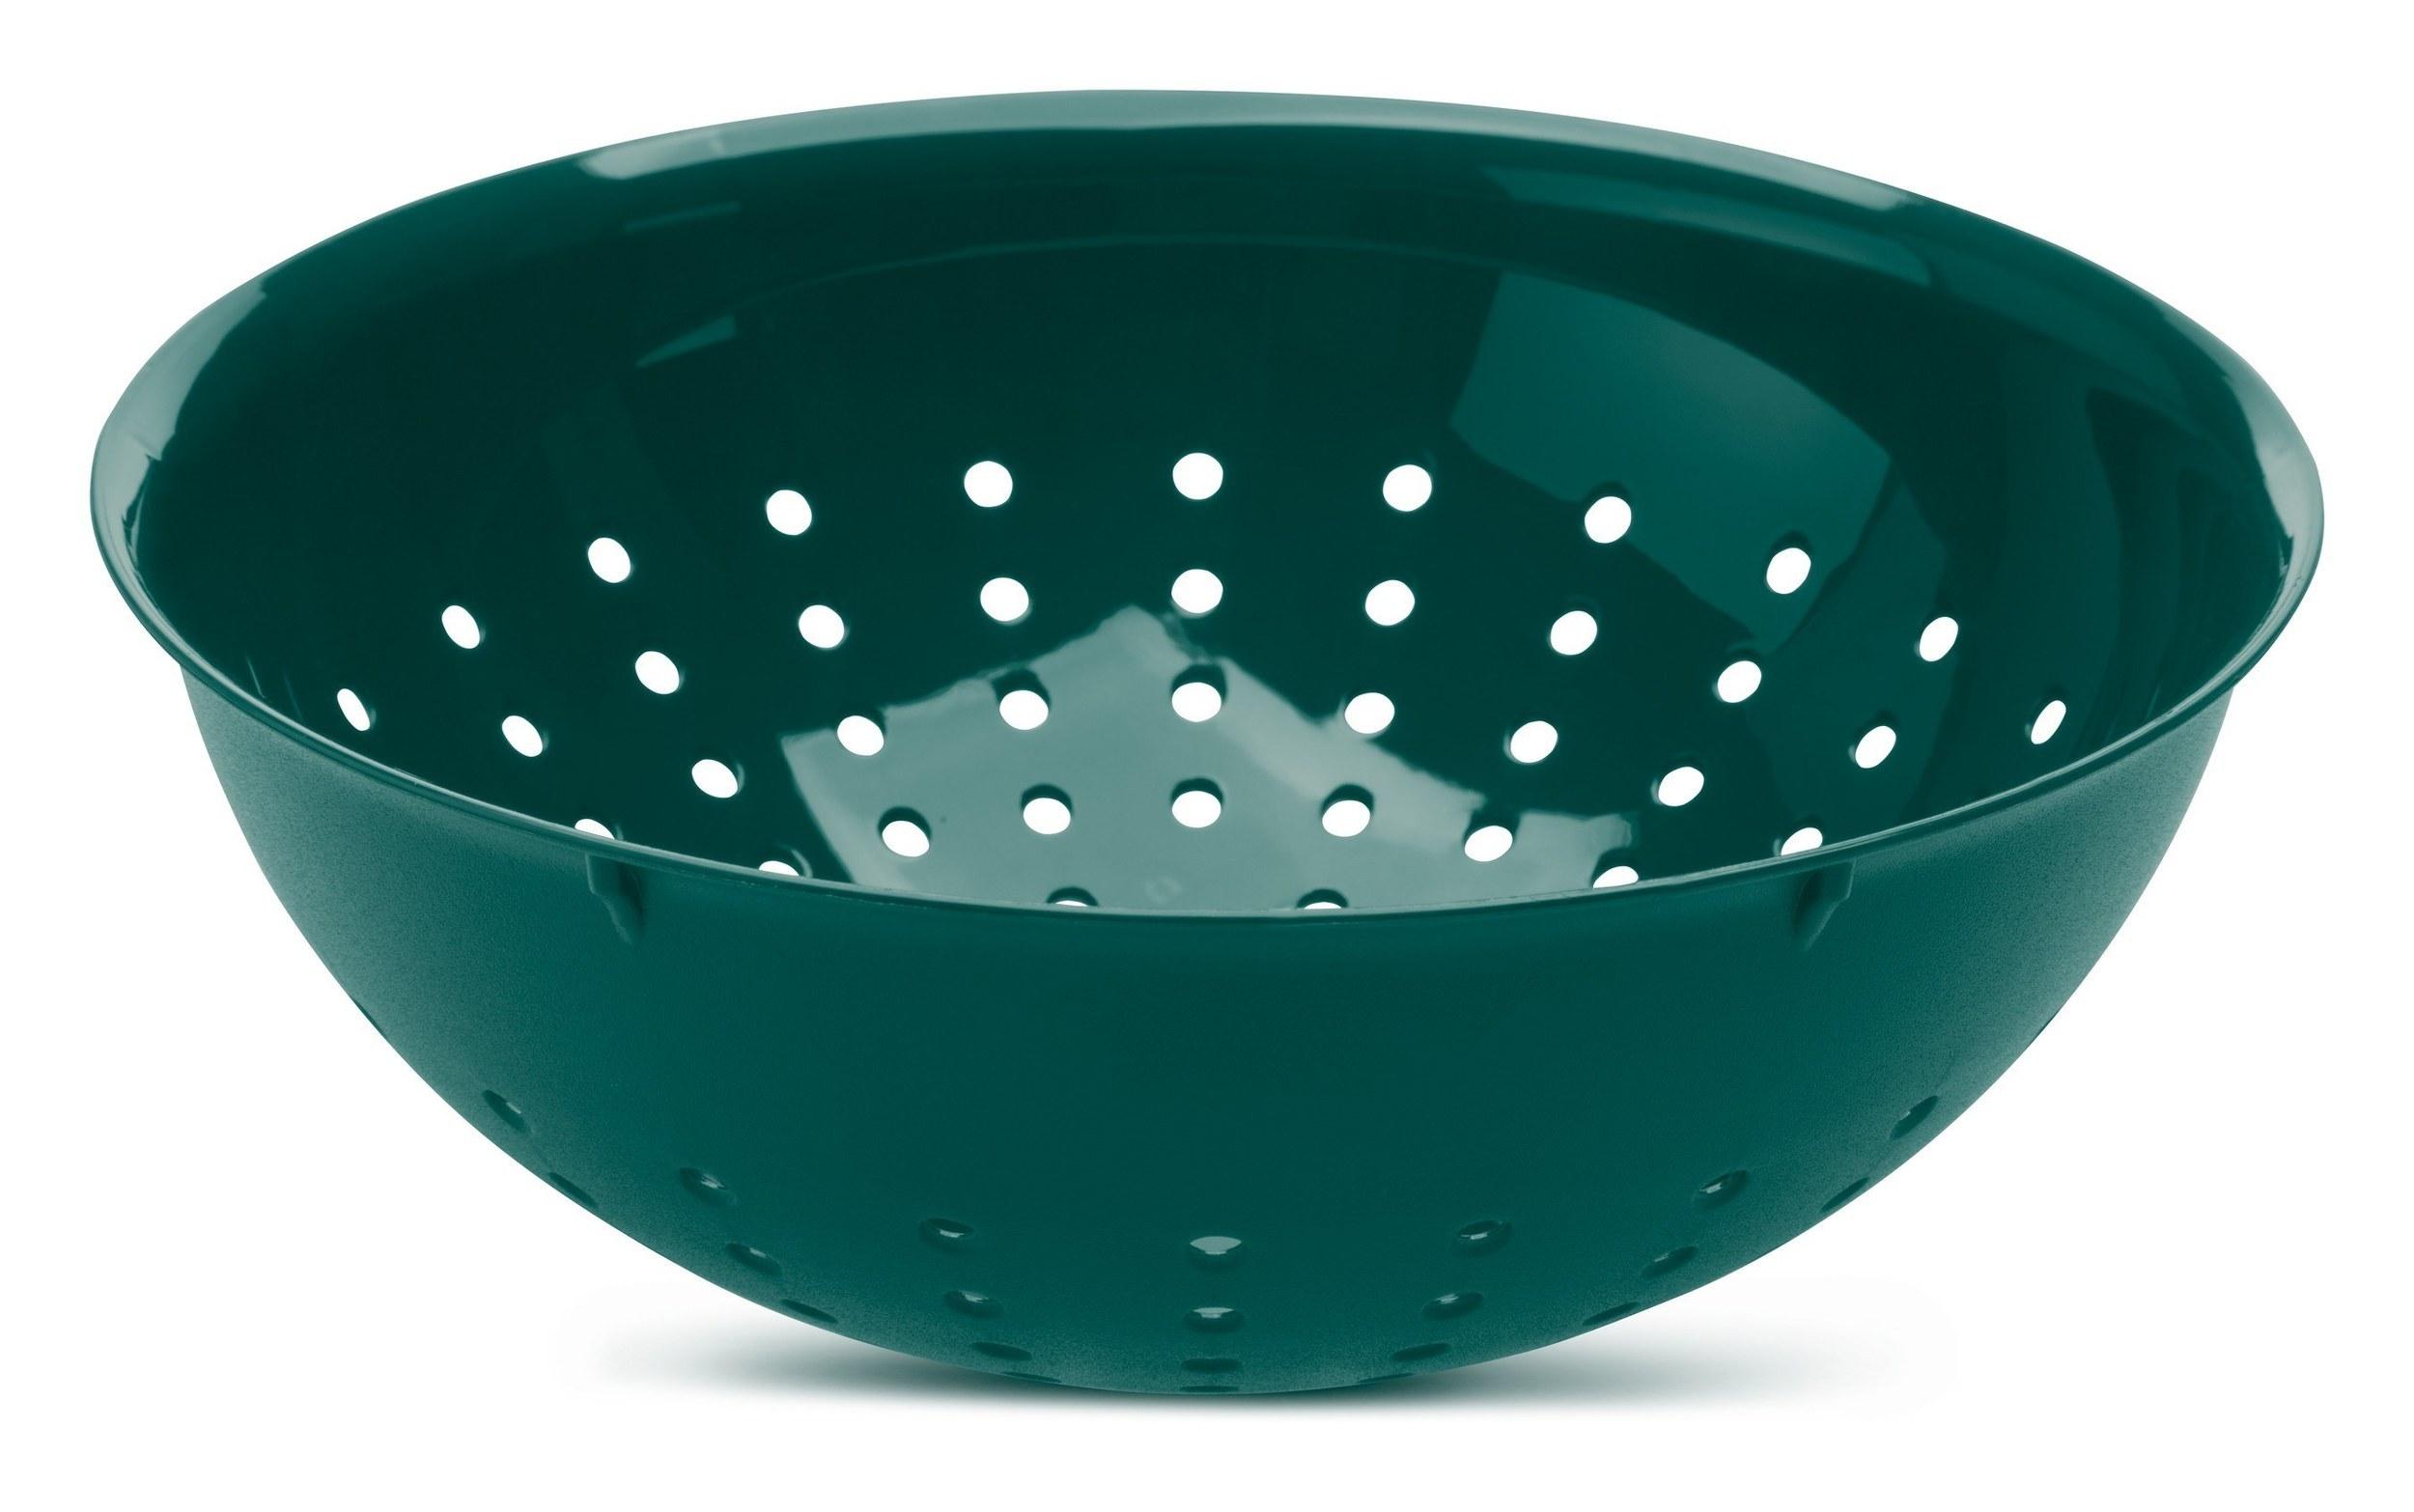 Durszlak 20 cm zieleń emerald